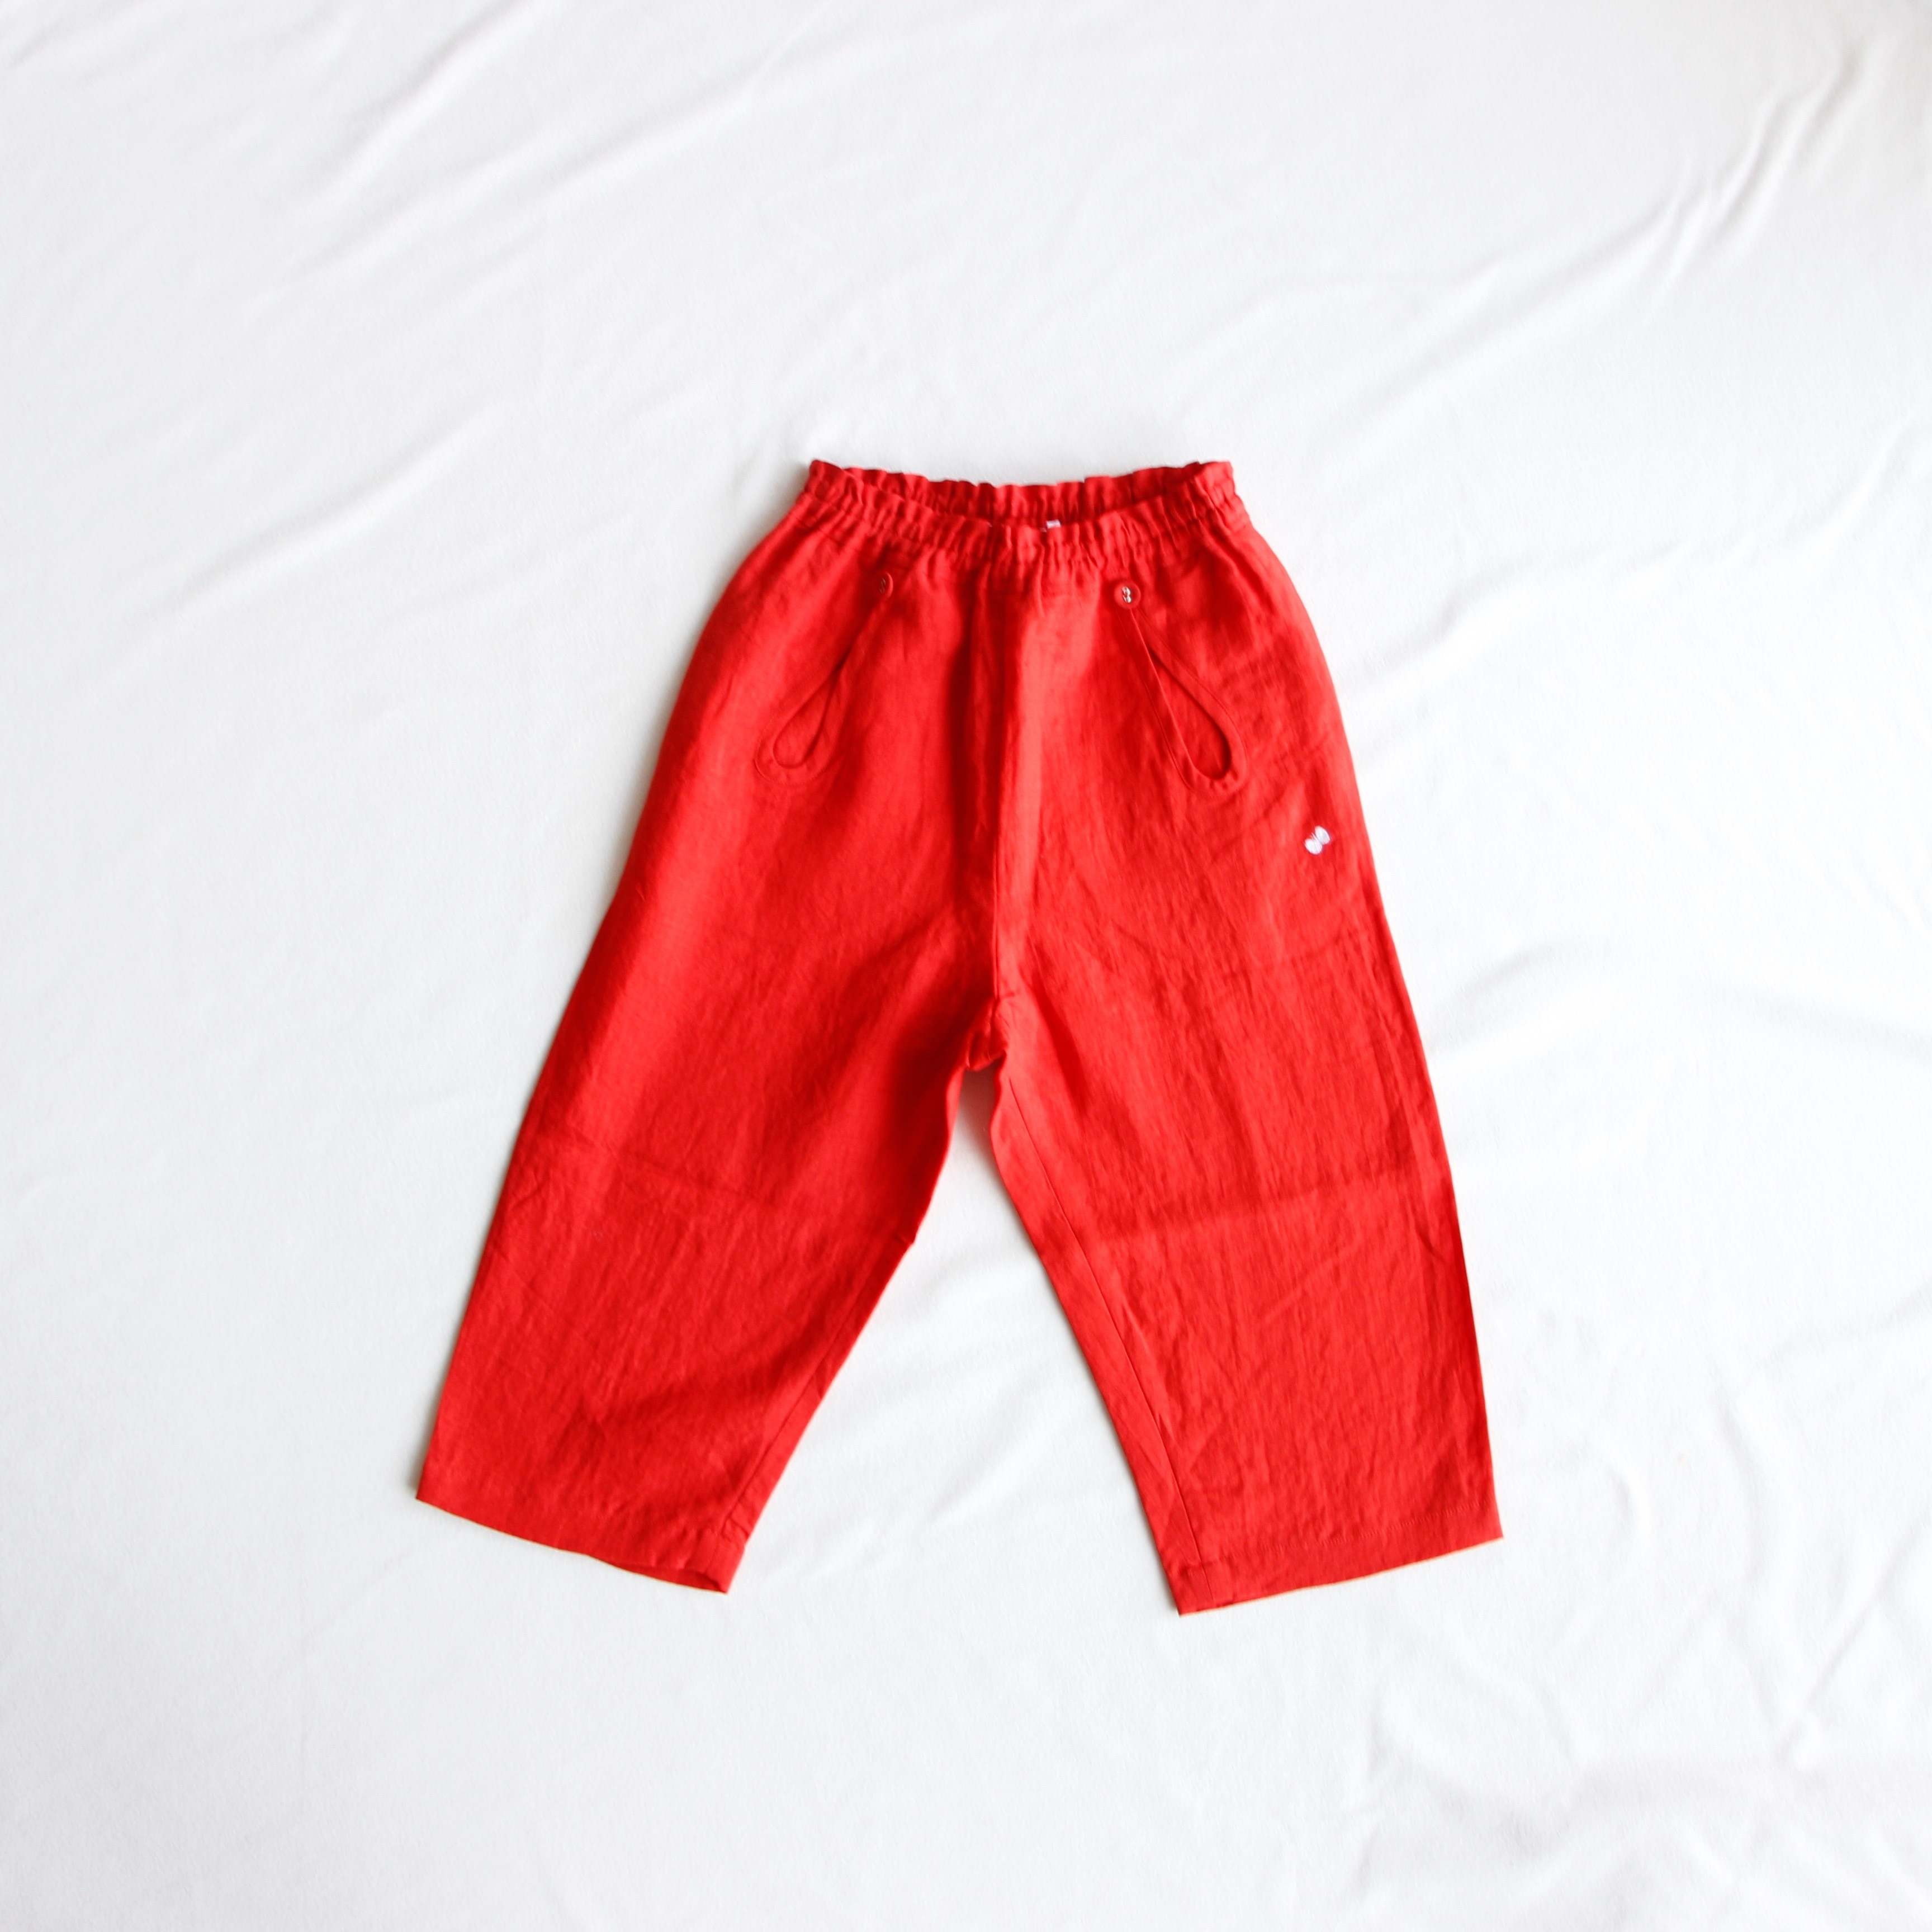 《mina perhonen 2017SS》bonbon パンツ / red / 110・120cm